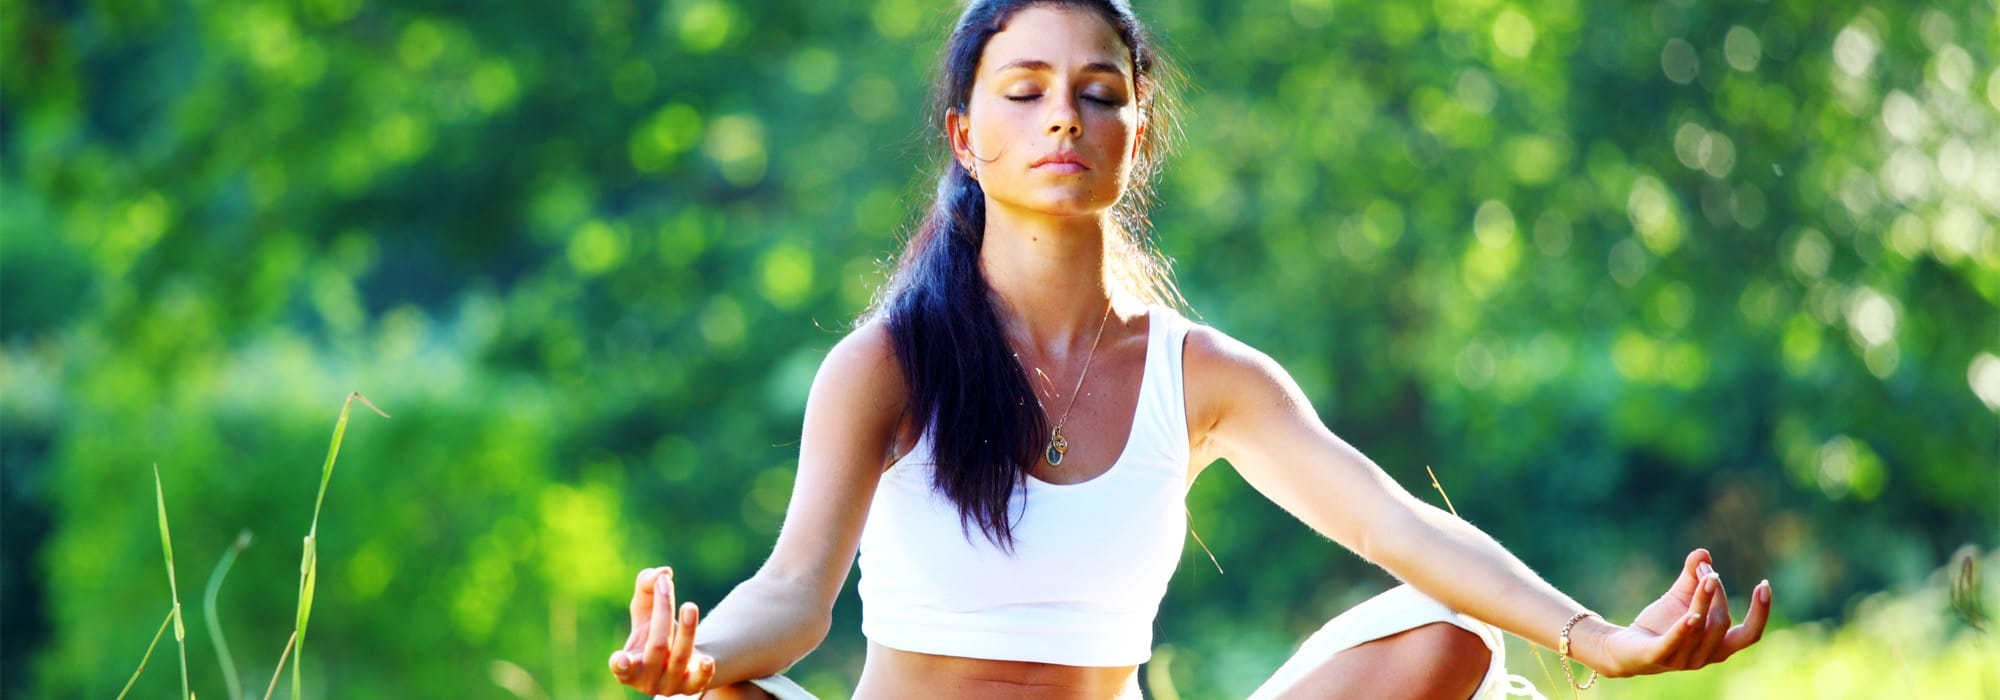 Positive Health Habits